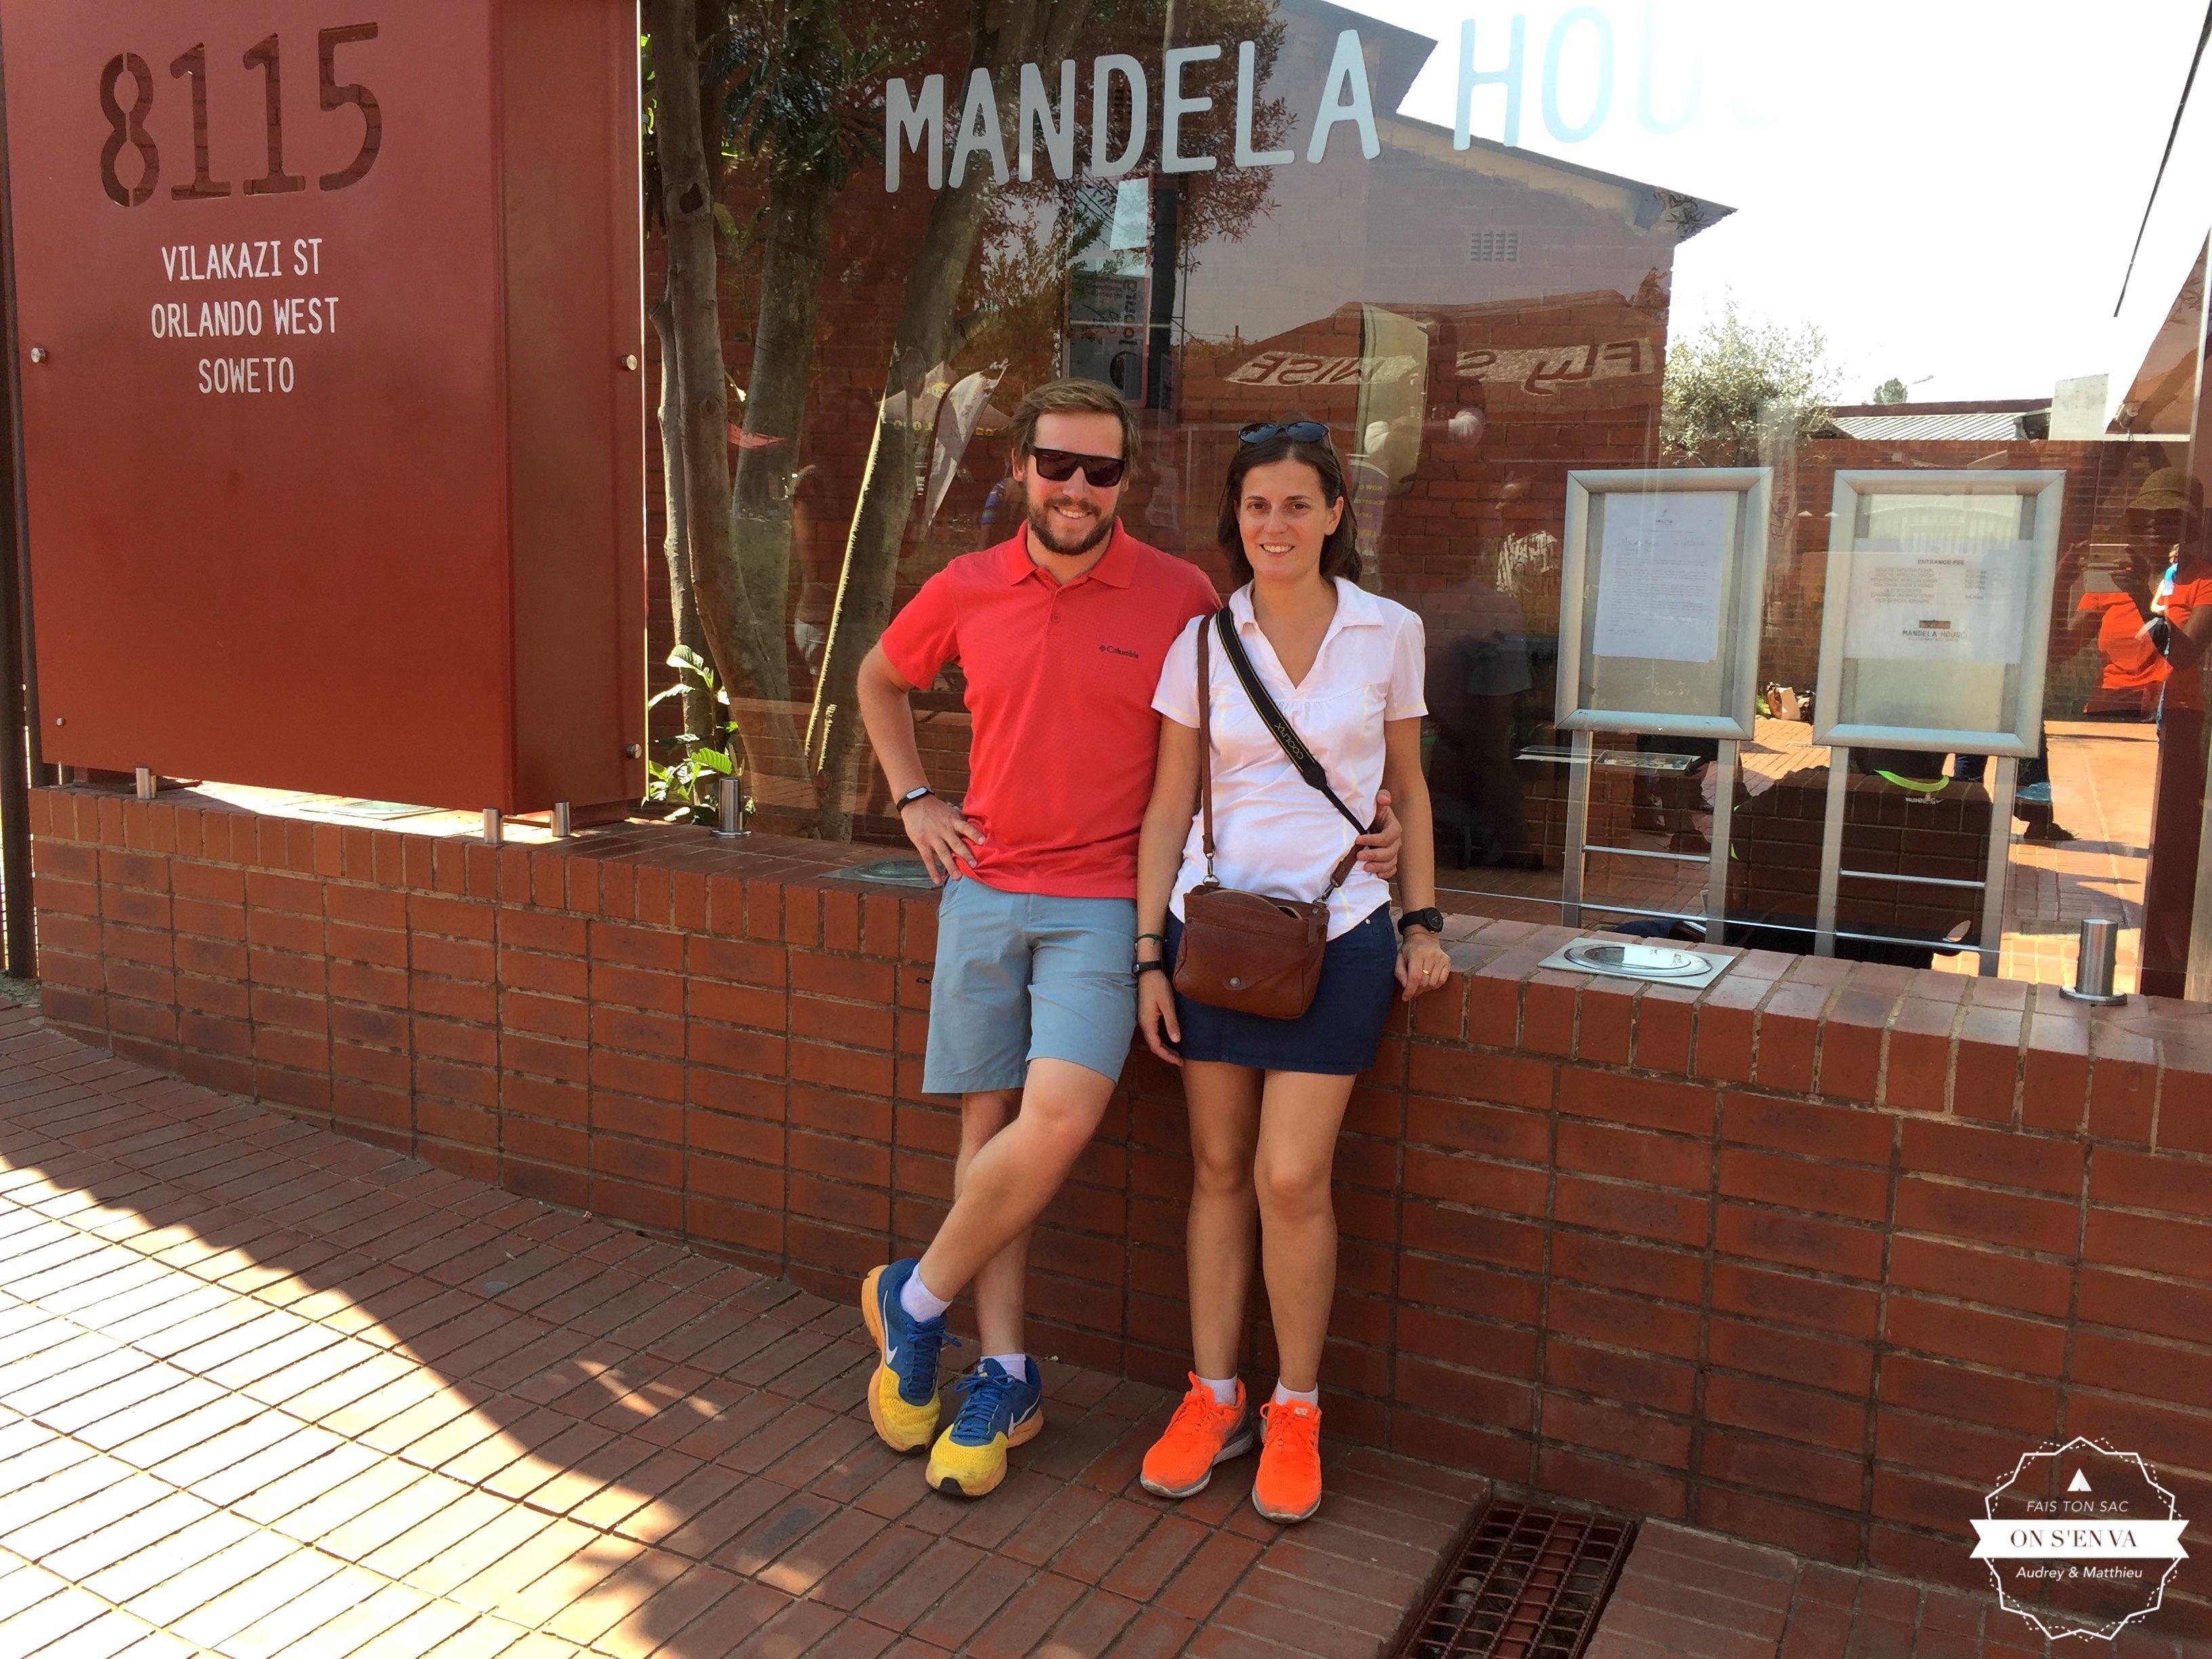 Maison de Nelson Mandela